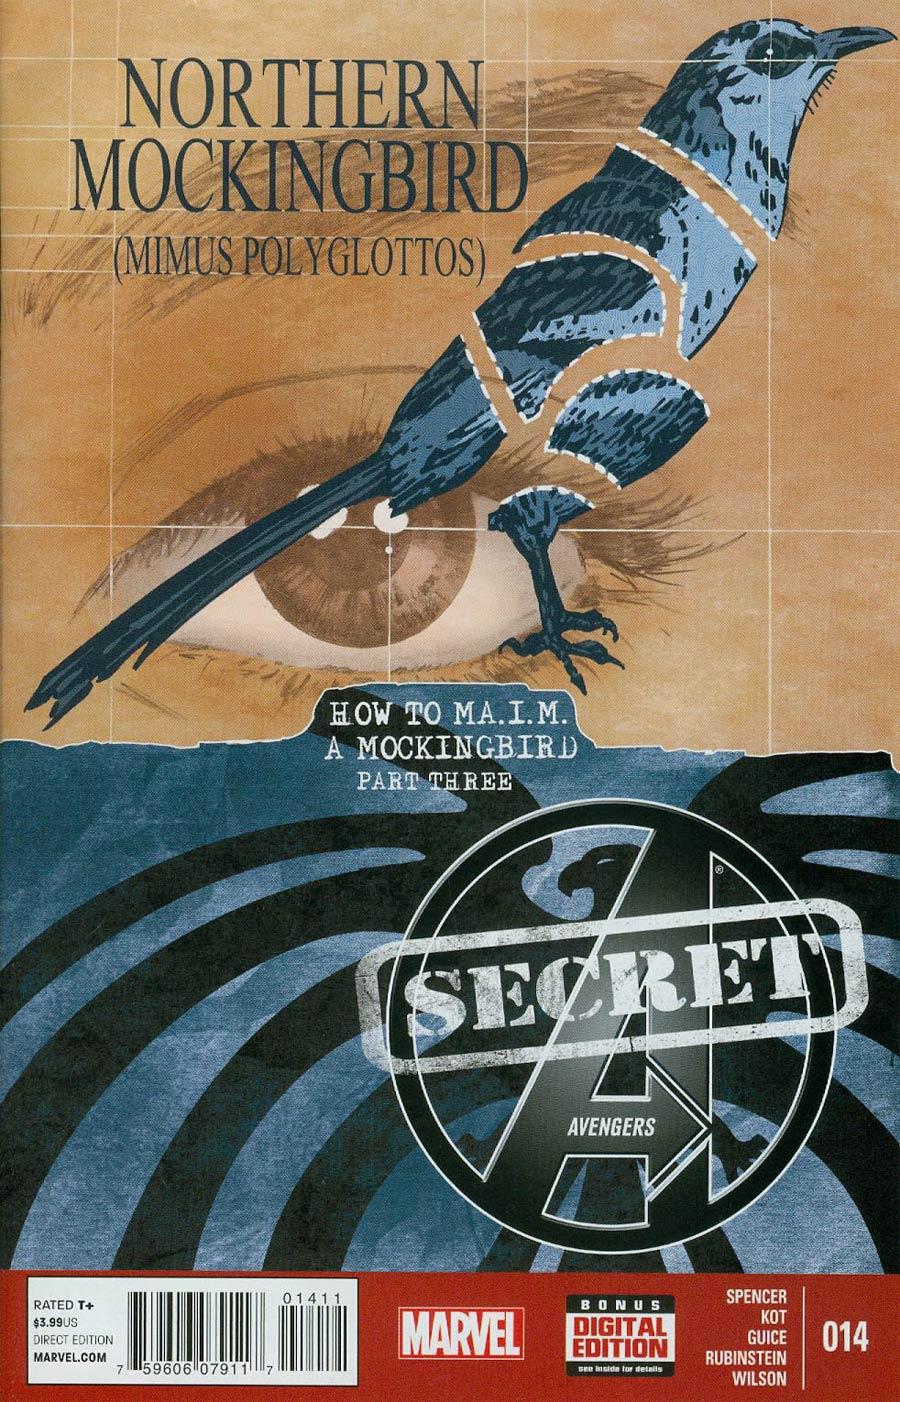 Secret Avengers Vol 2 #14